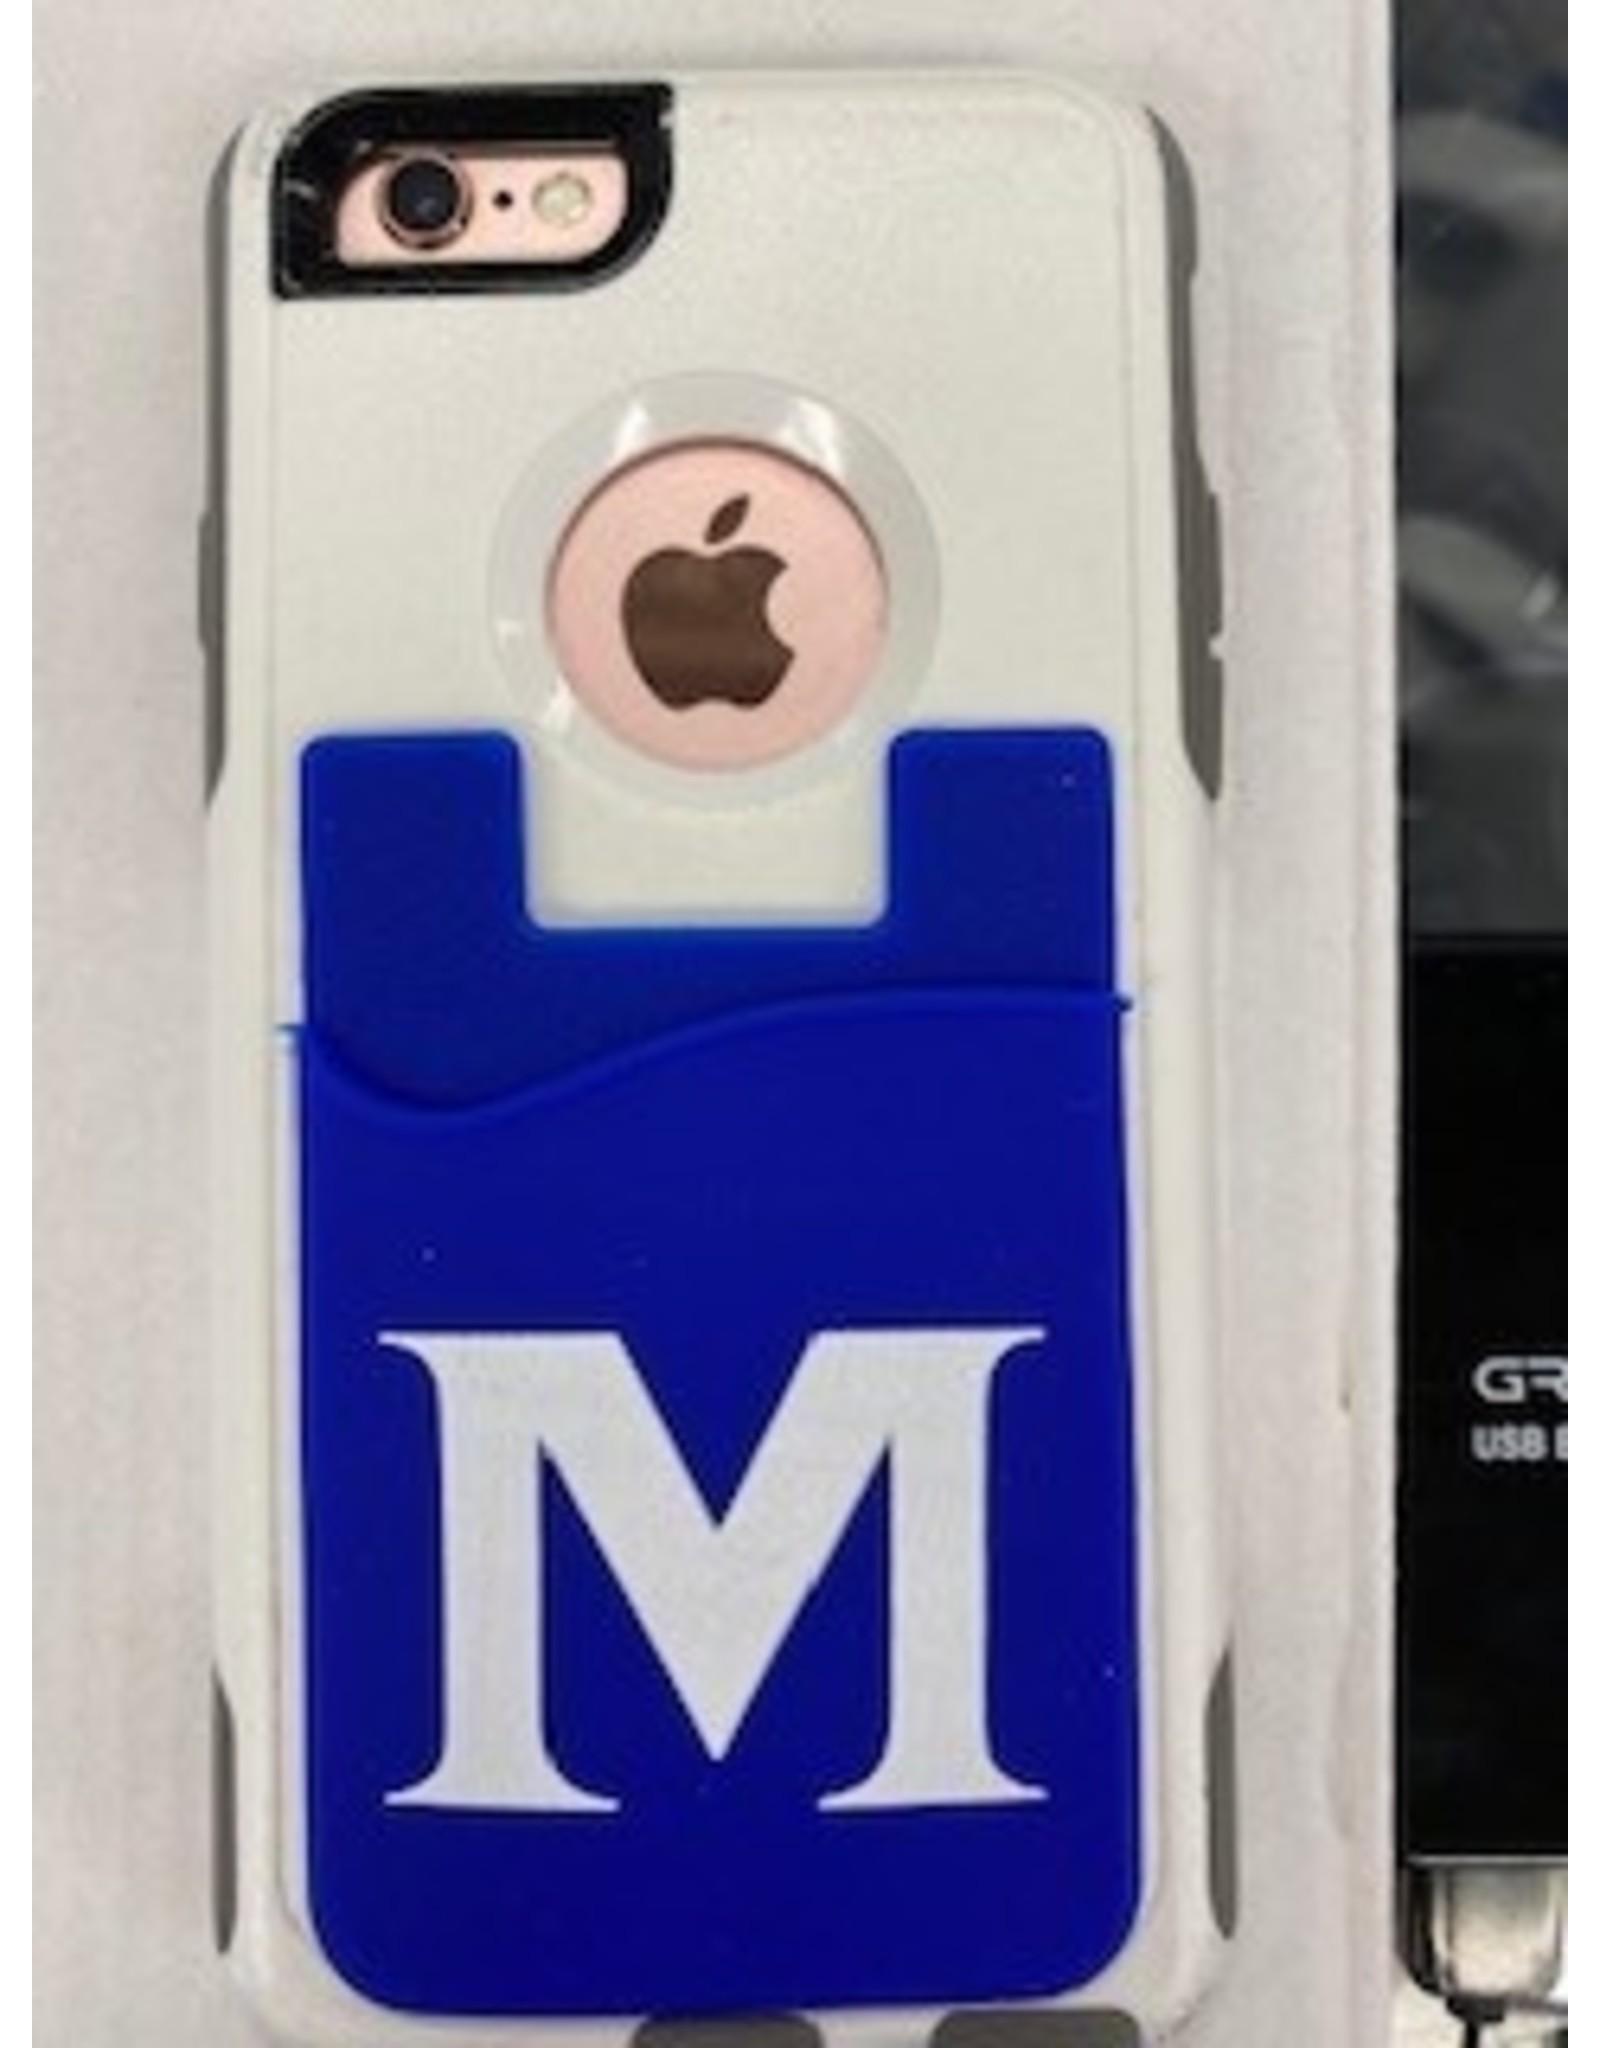 ADHESIVE PHONE CARD HOLDER